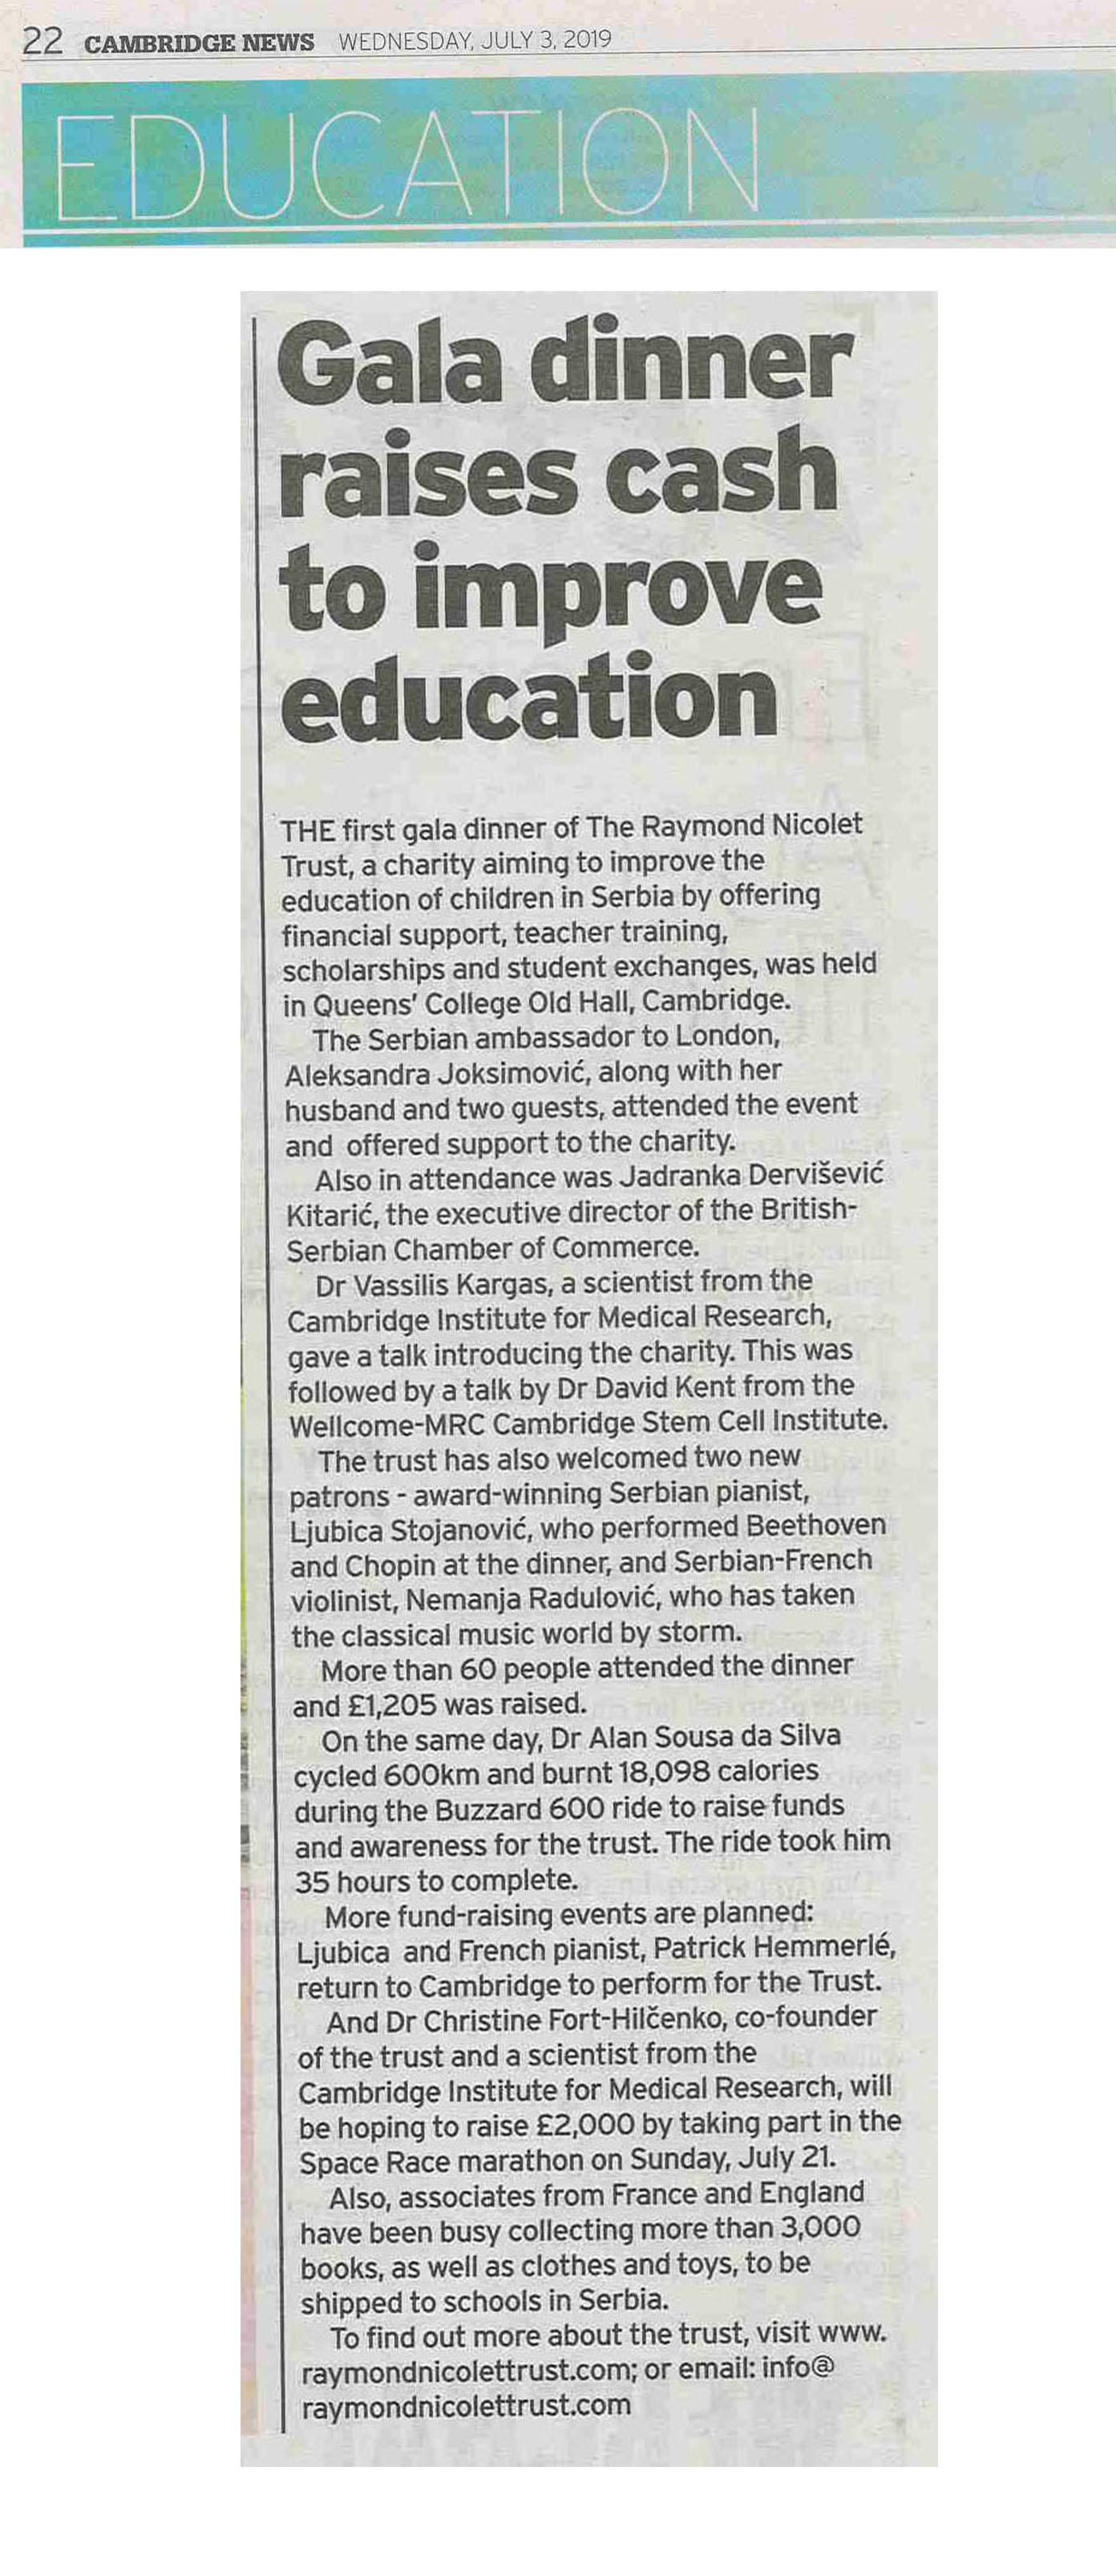 cambridge_news_3july2019.jpg